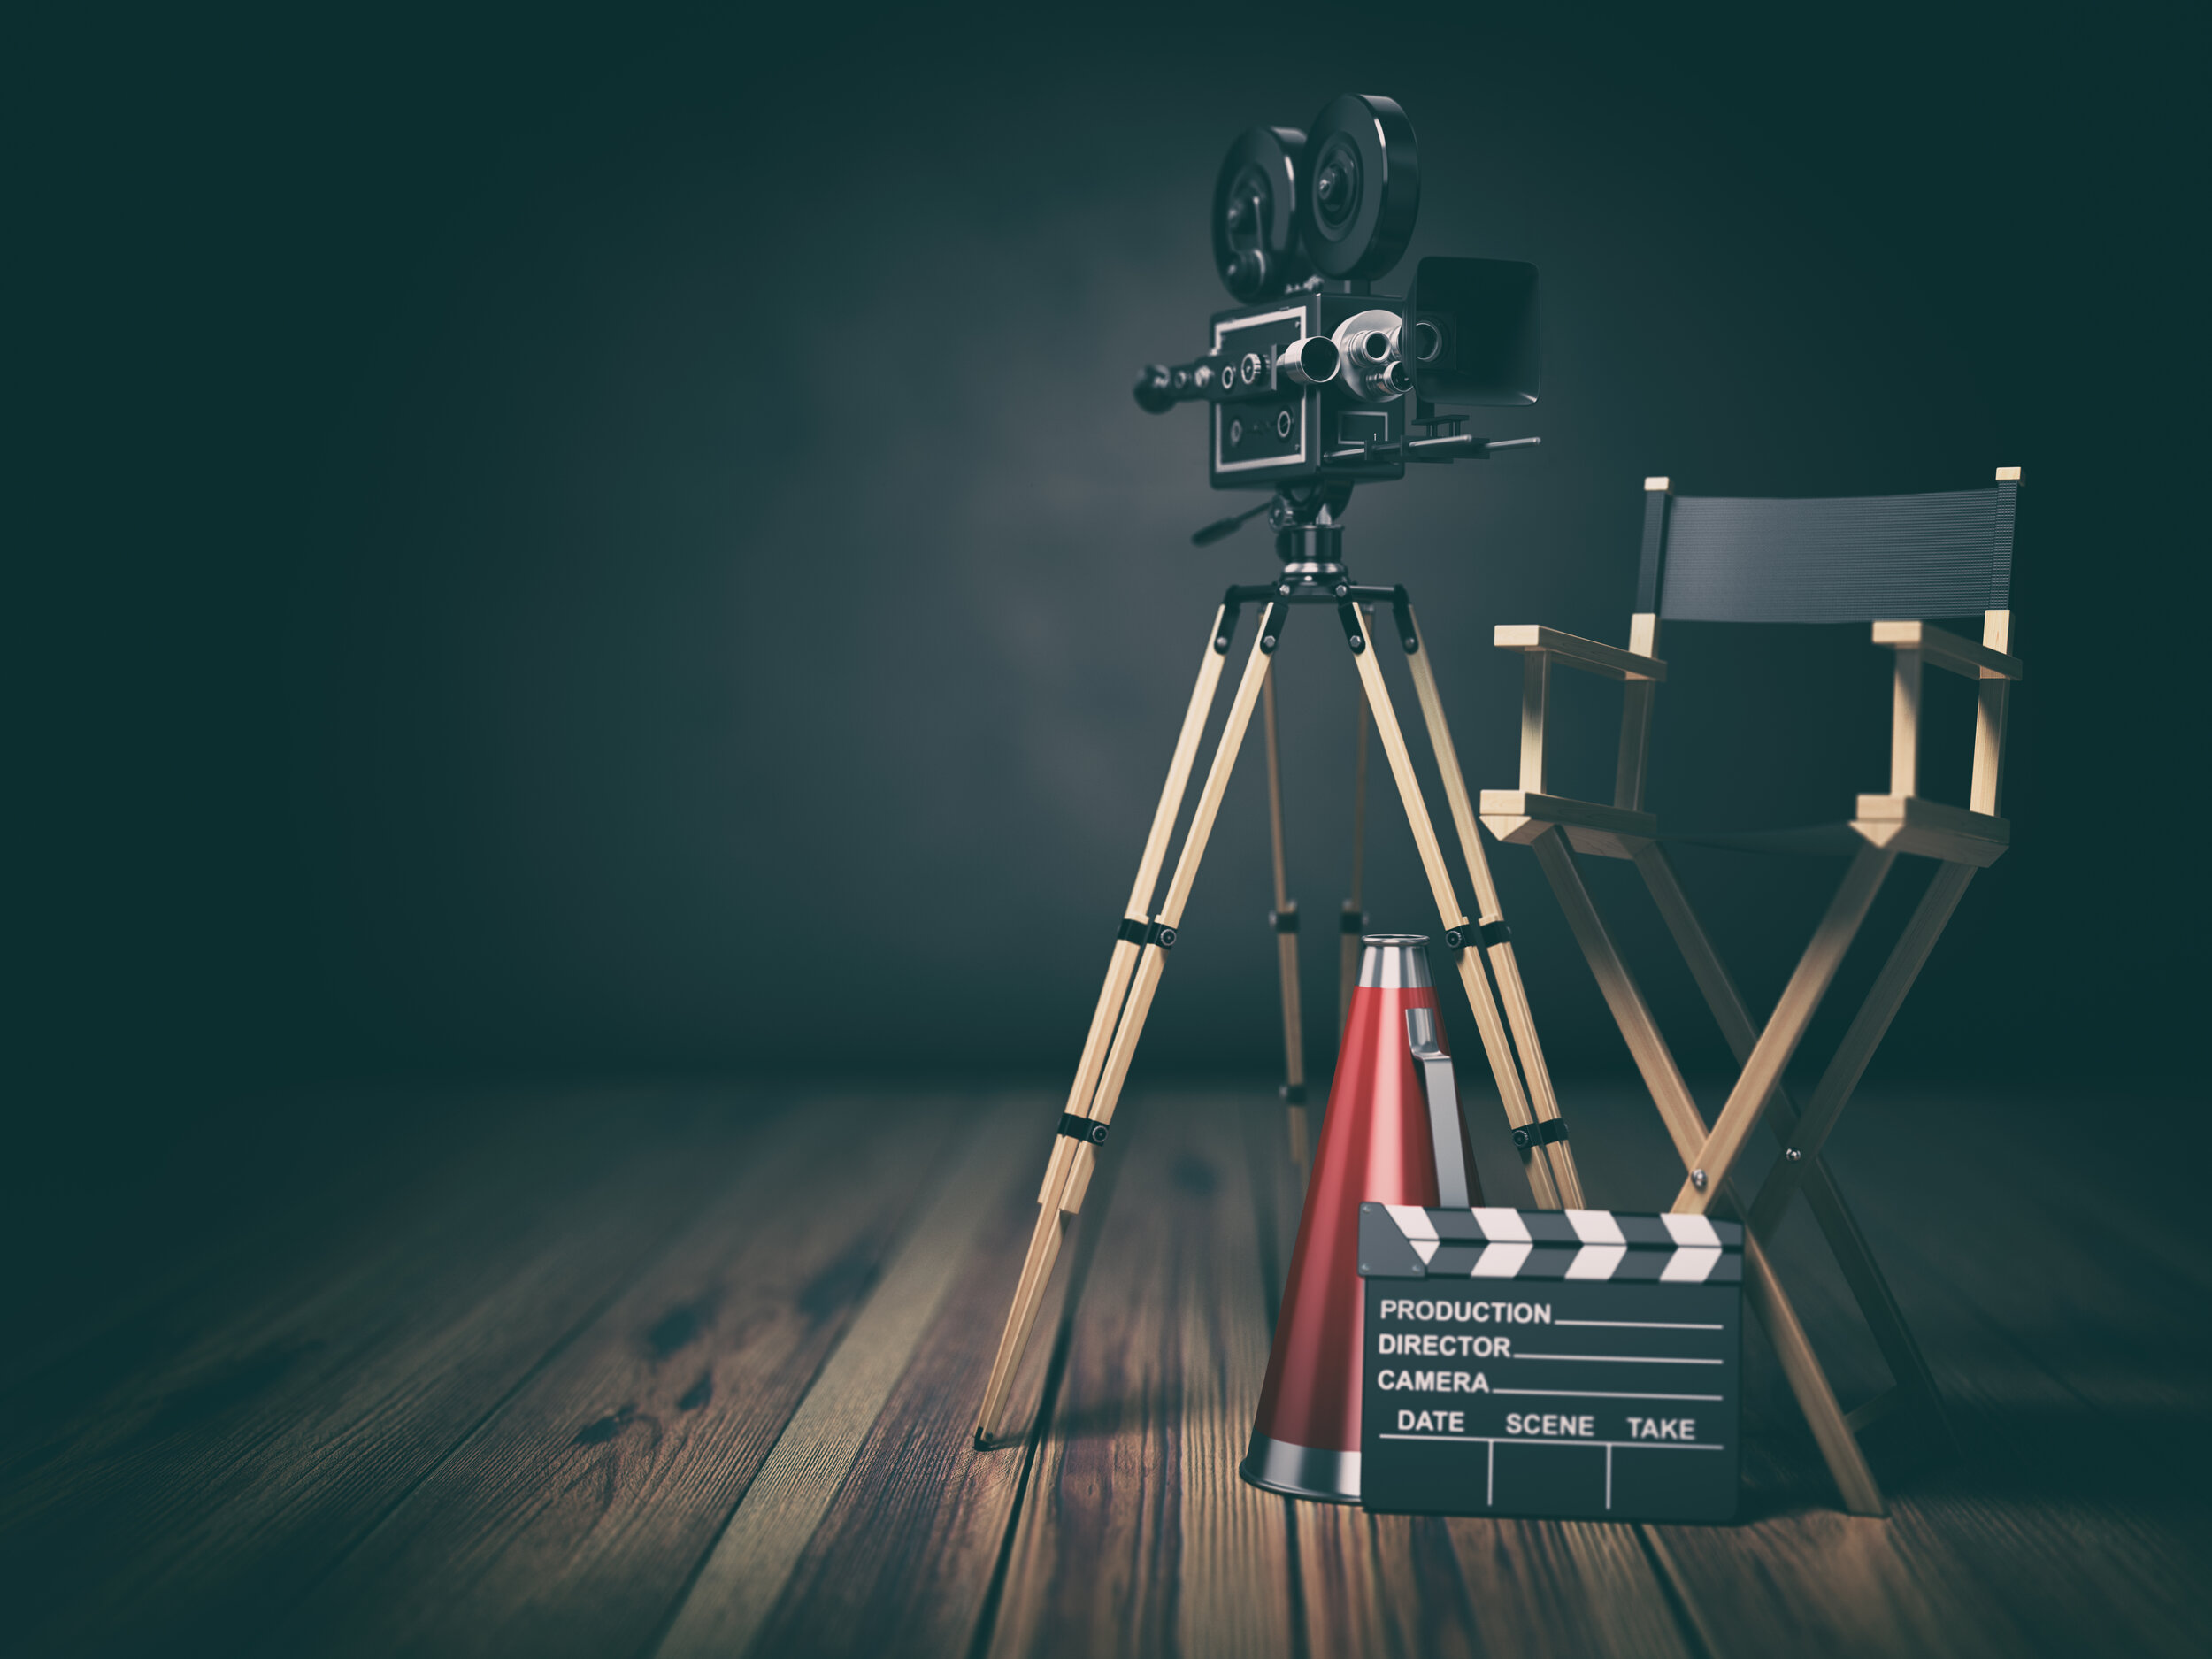 video-movie-cinema-concept-retro-camera-clapperboa-P6VW6RV.jpg